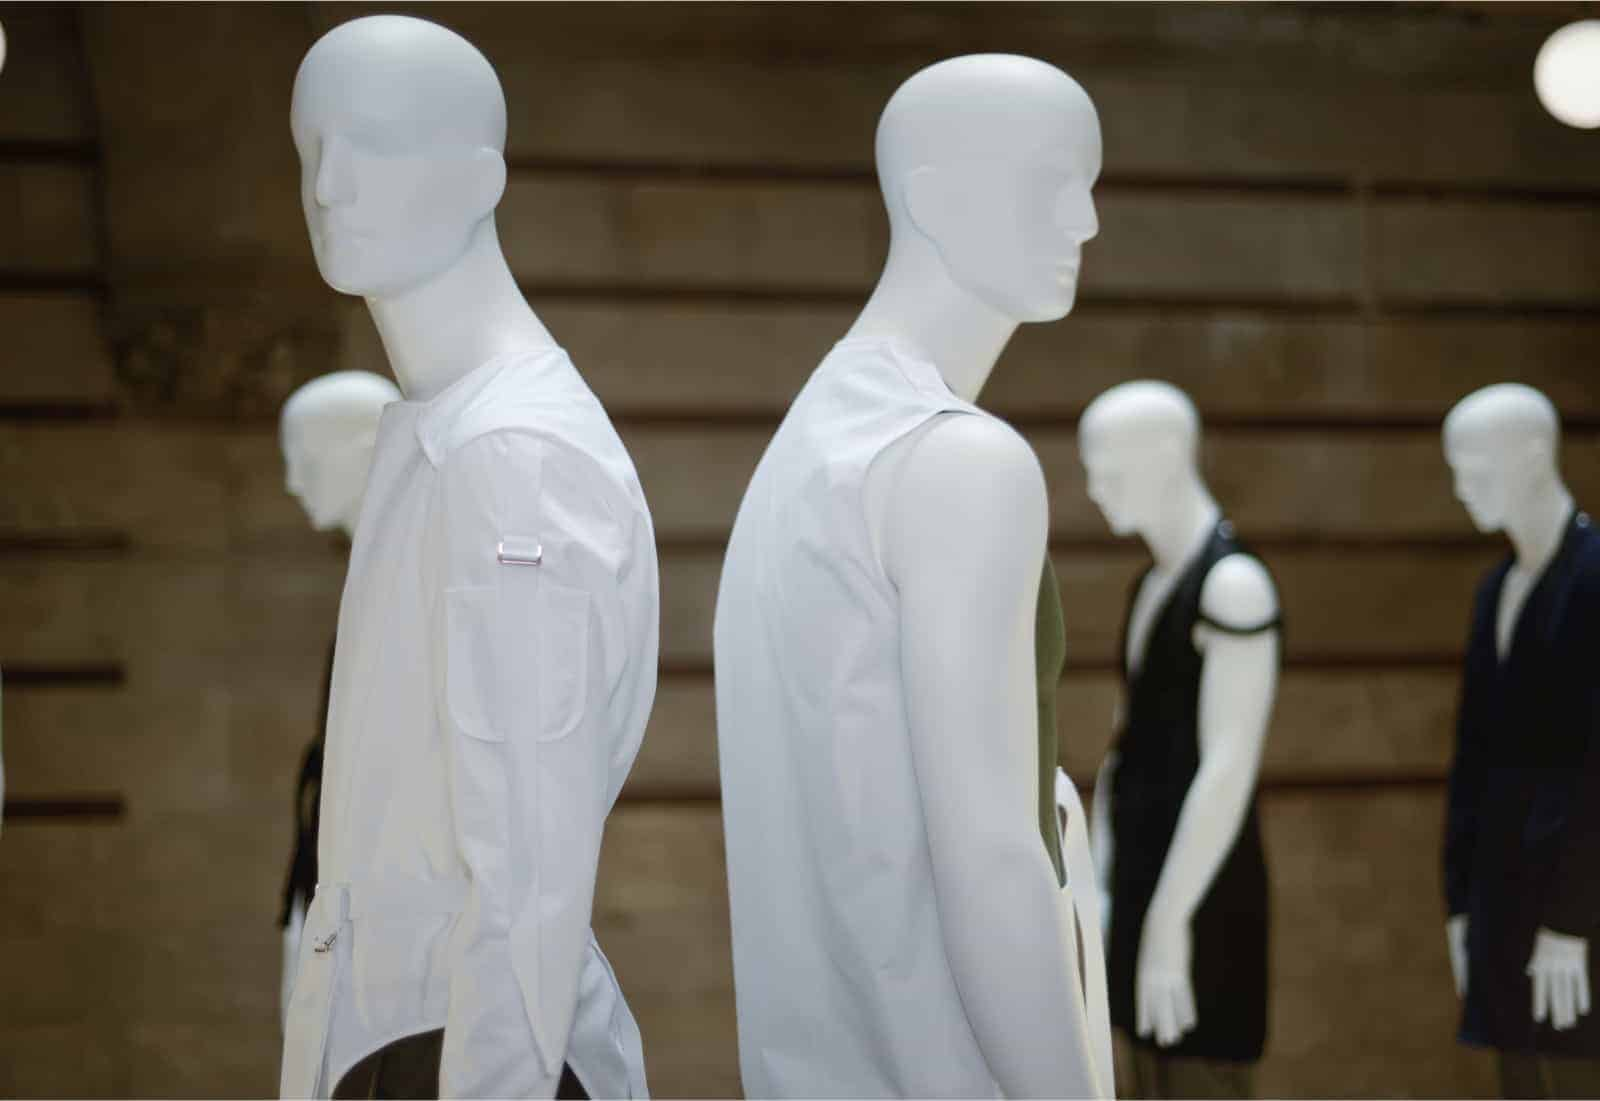 Launch Event: Bonaveri Introduces Noble at London Collections Men SS16